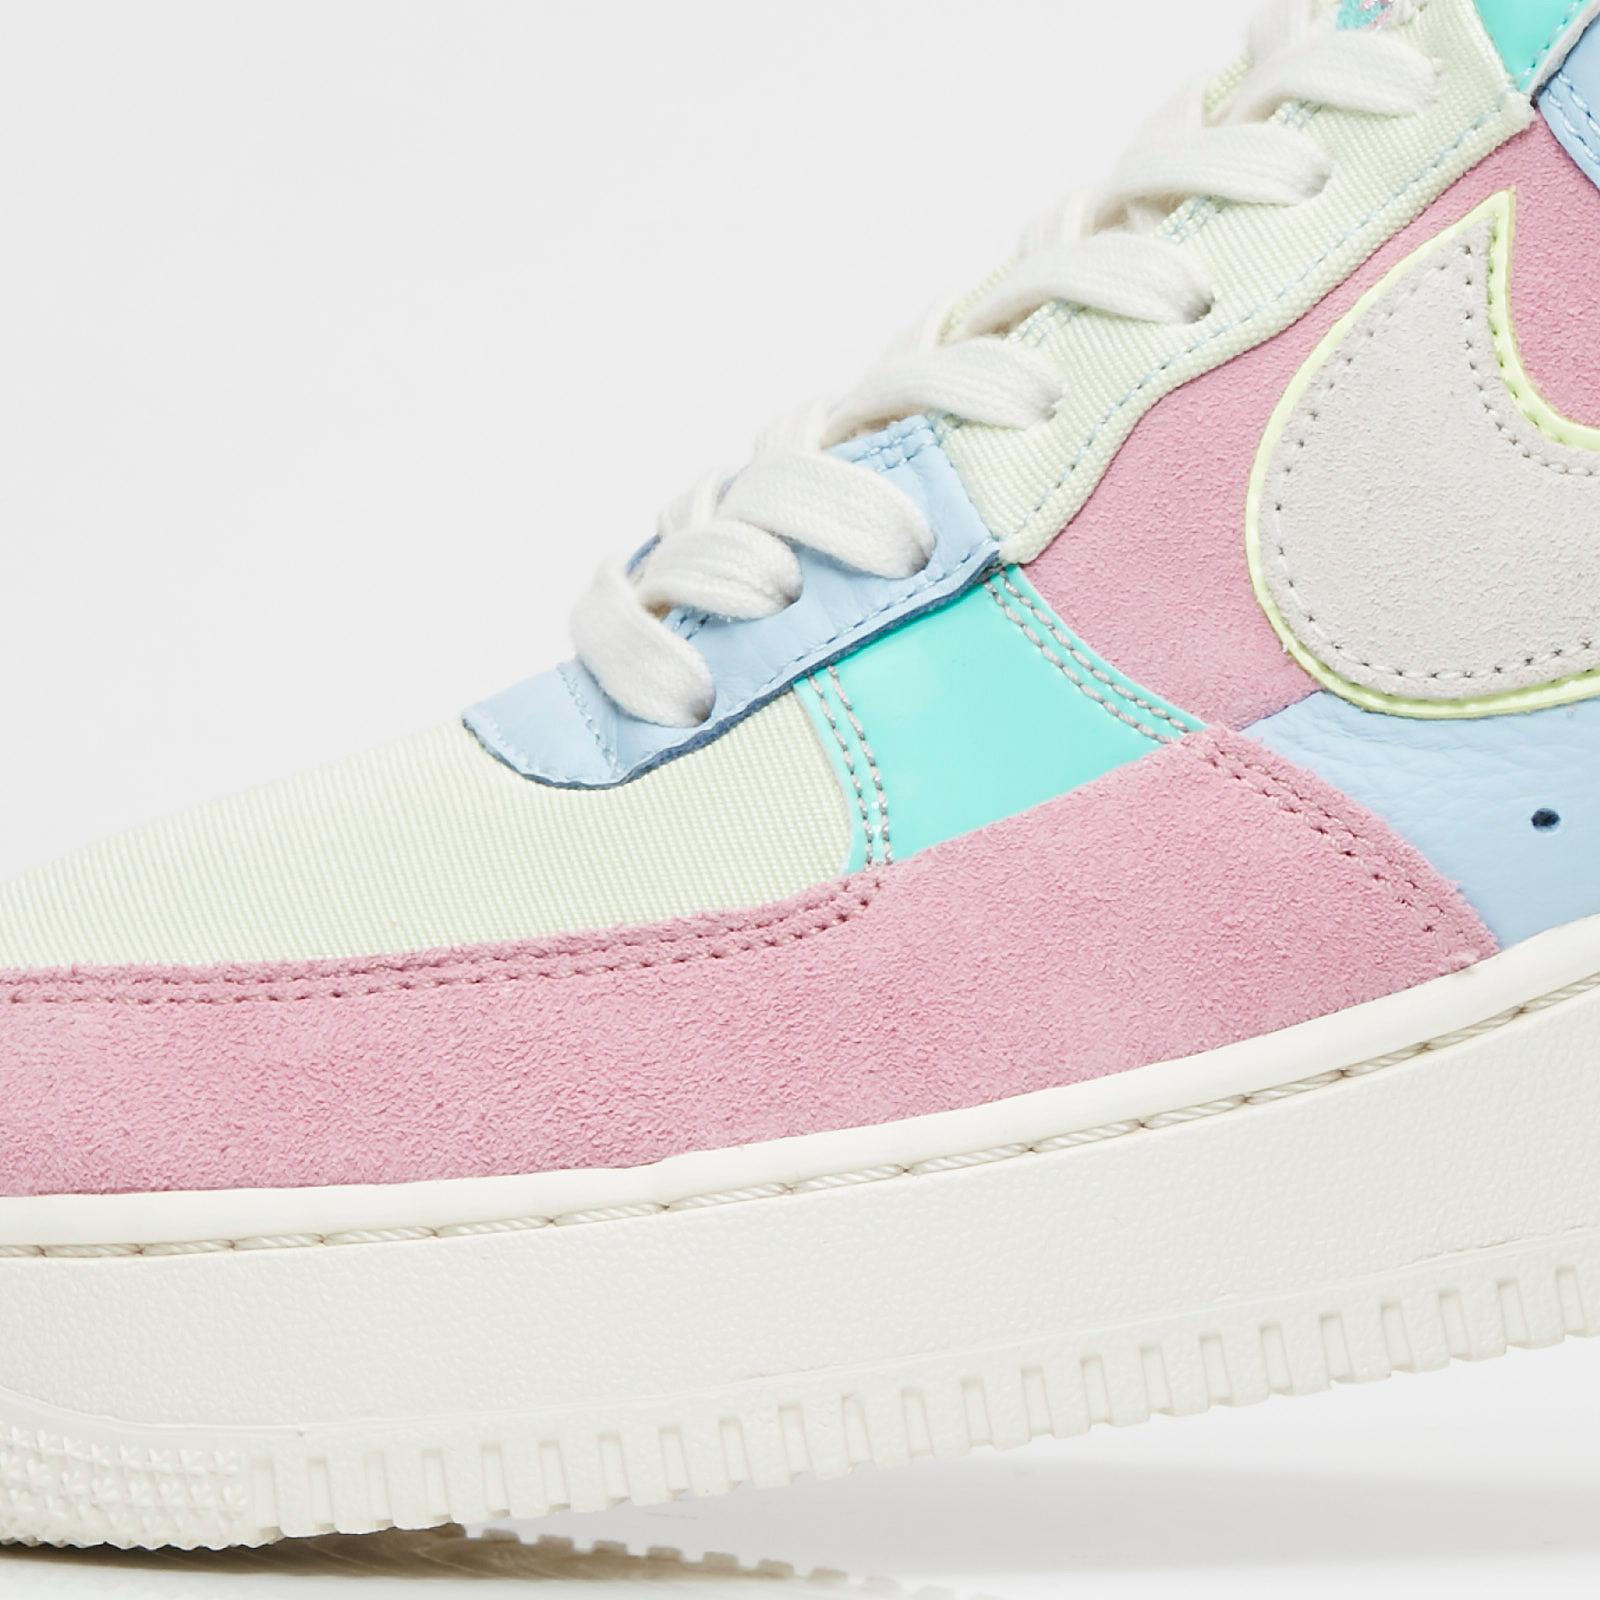 Nike Air Force 1 07 QS Ah8462 400 Sneakersnstuff I